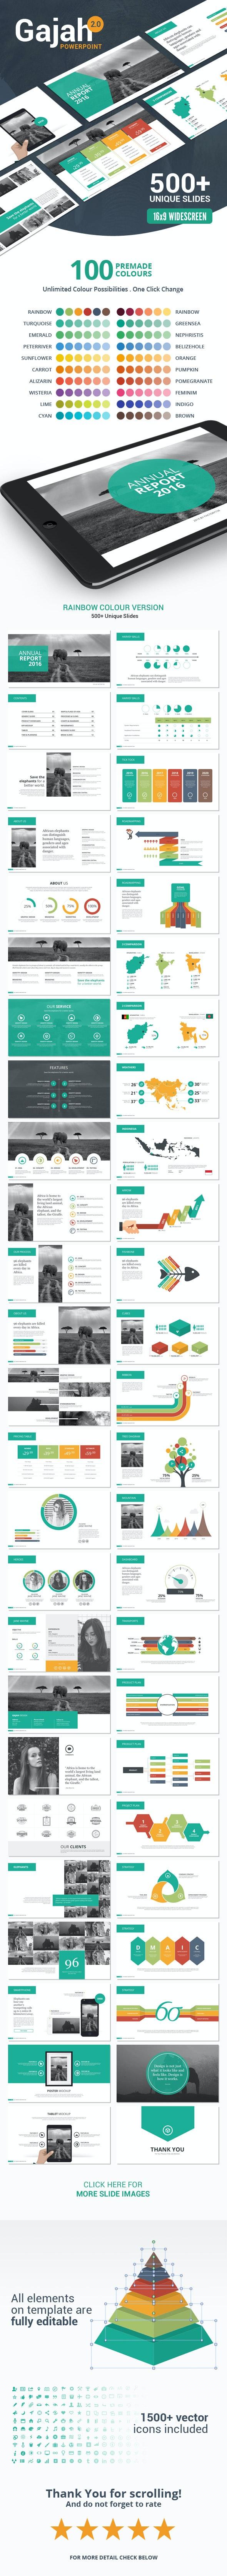 Gajah   PowerPoint Template - PowerPoint Templates Presentation Templates